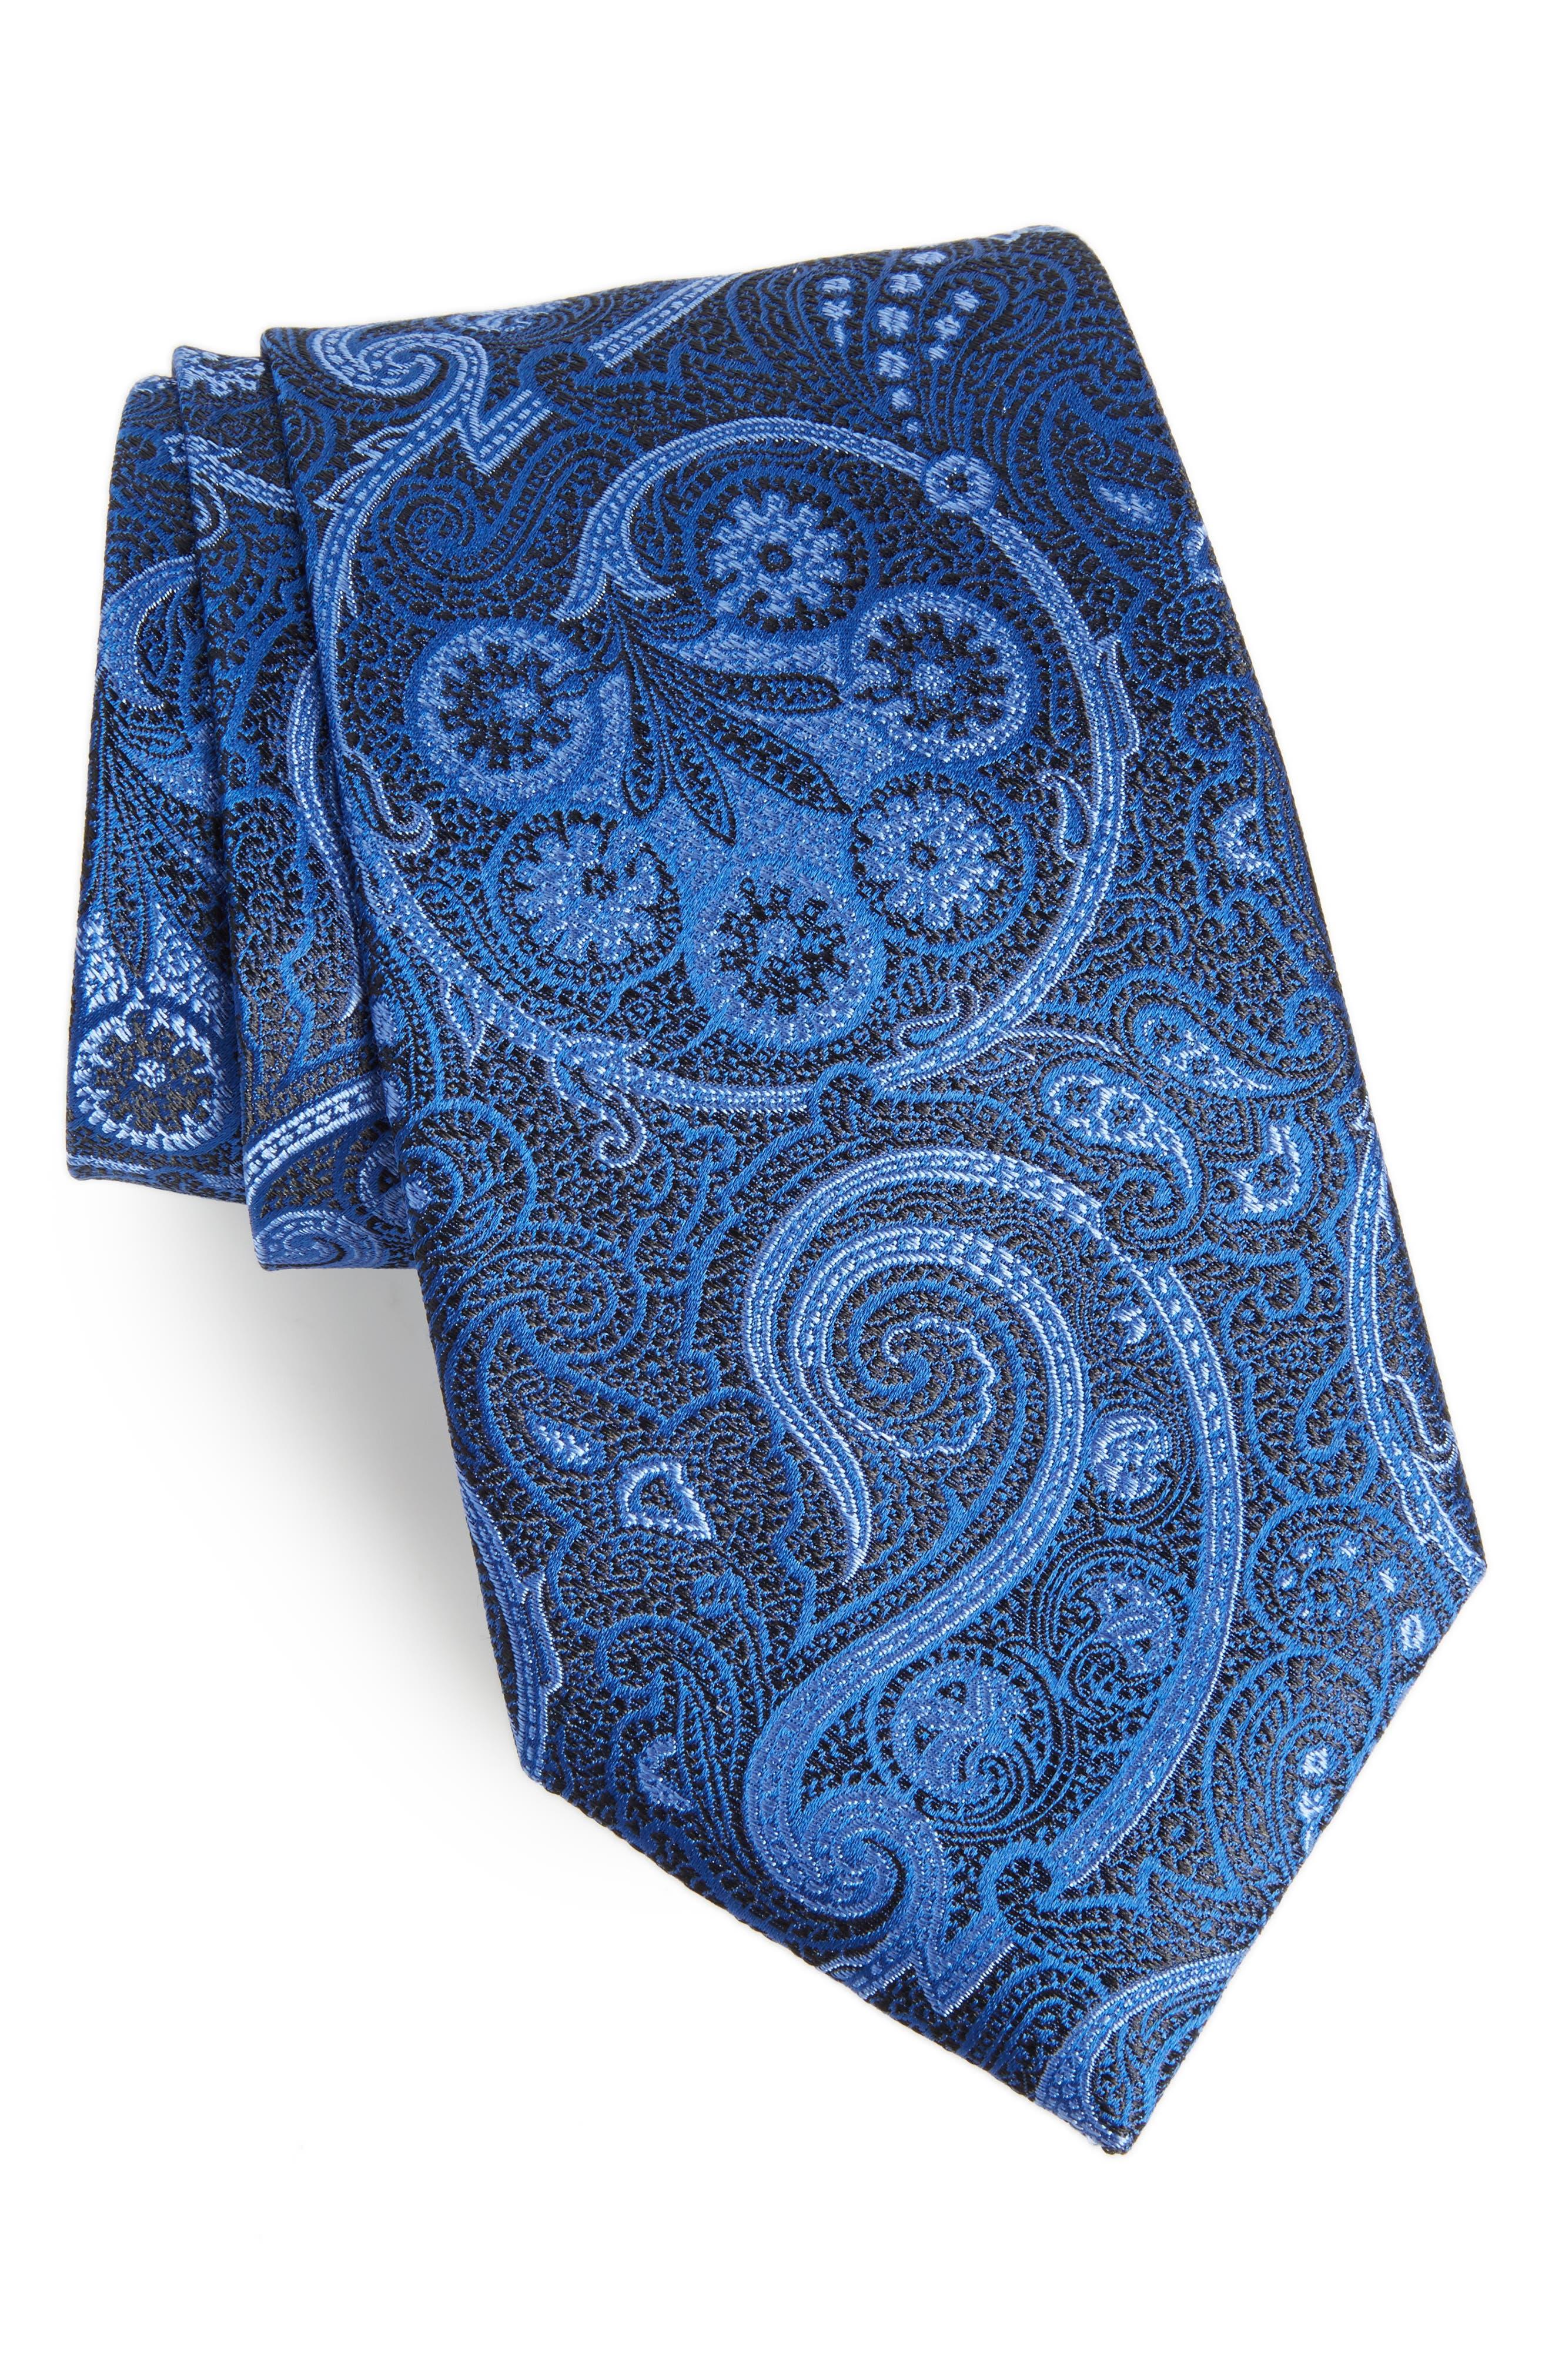 Alternate Image 1 Selected - Nordstrom Men's Shop Provincial Paisley Silk Tie (X-Long)